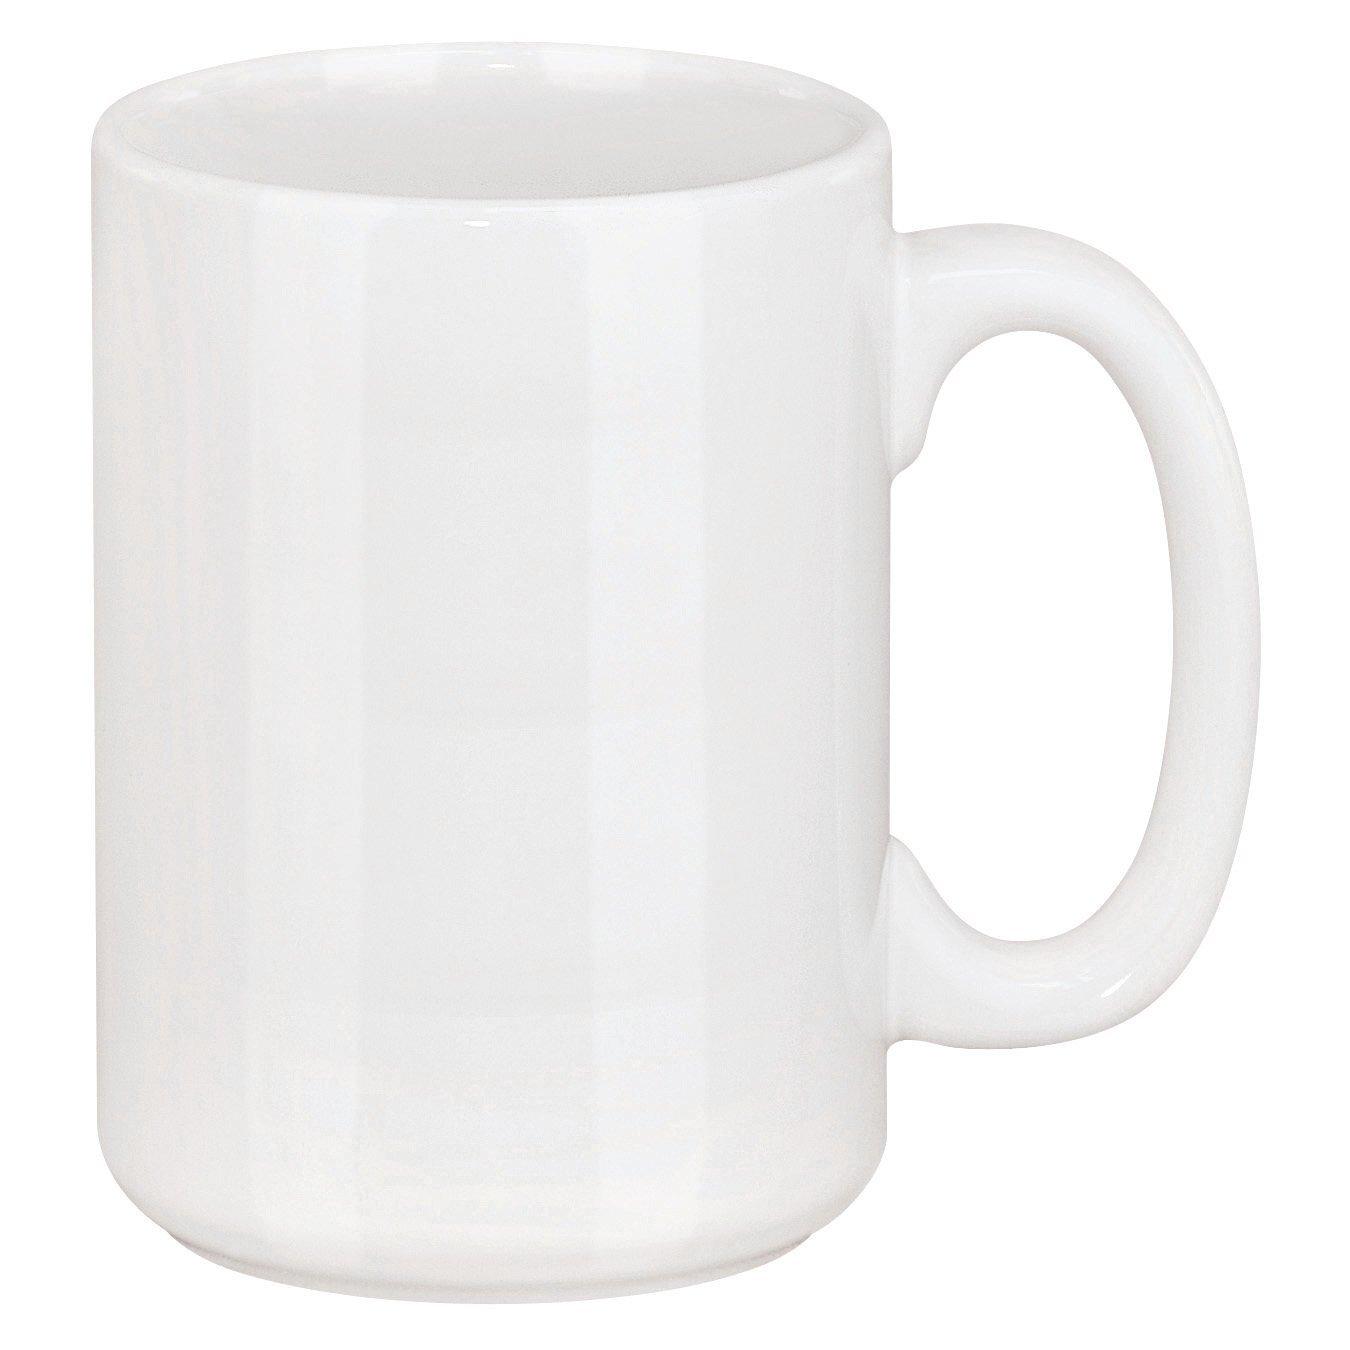 Magnum Ceramic Mug, 15oz.